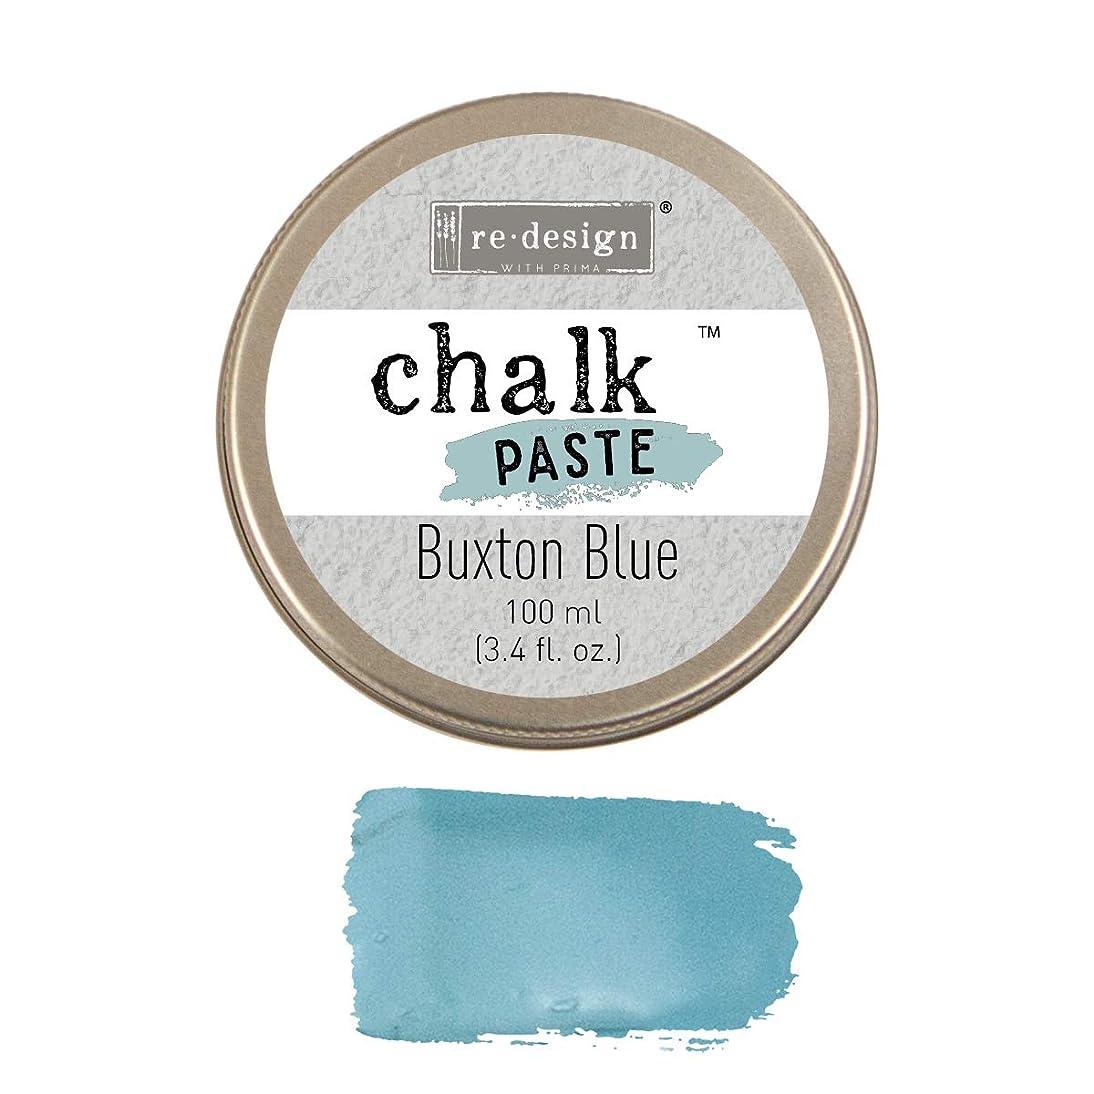 Prima Marketing Inc. 635343 Redesign Chalk Paste, Buxton Blue